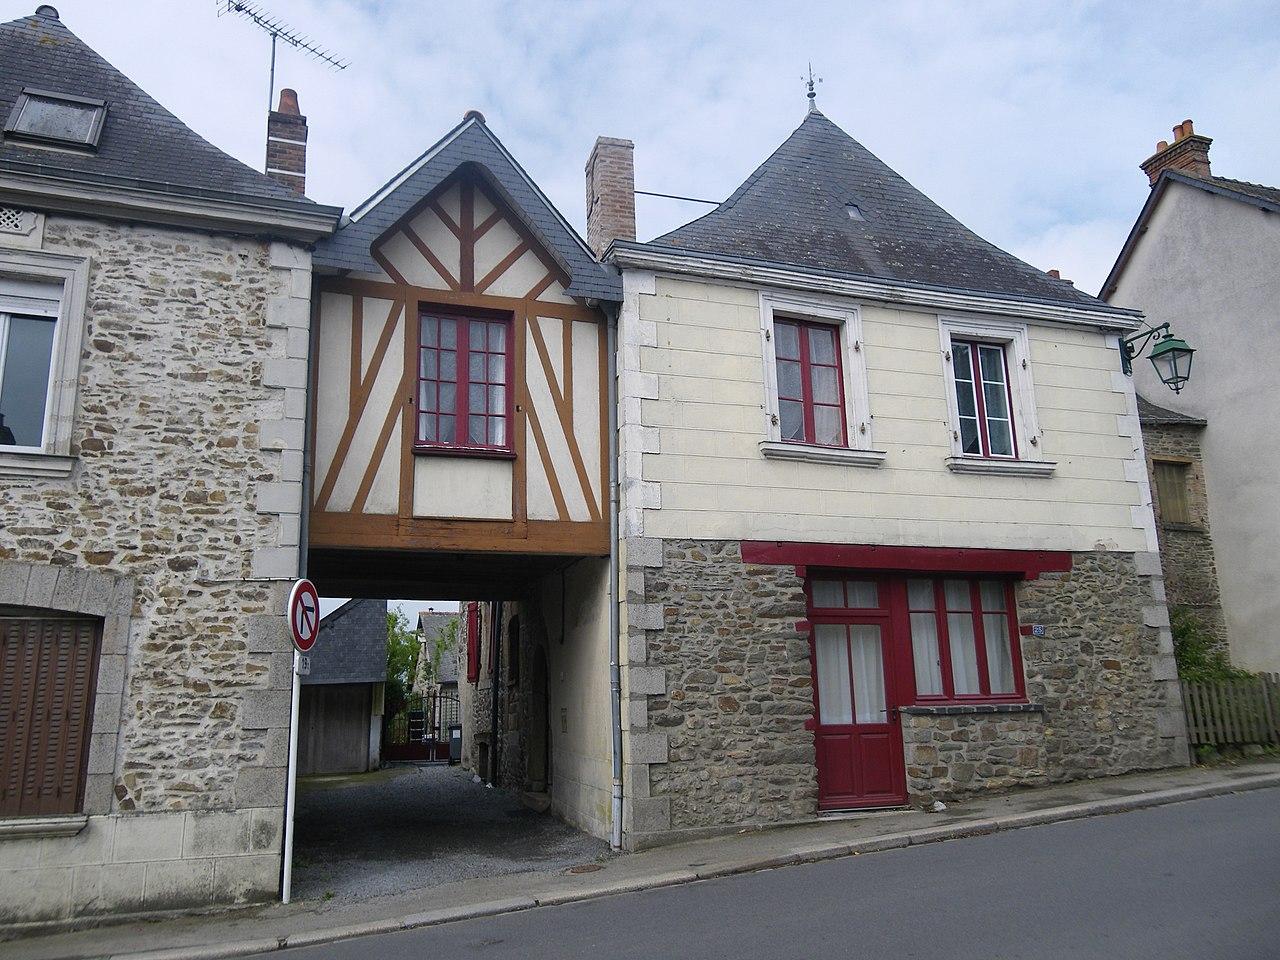 File:Maison ancienne a gennes sur seiche - panoramio (1).jpg ...